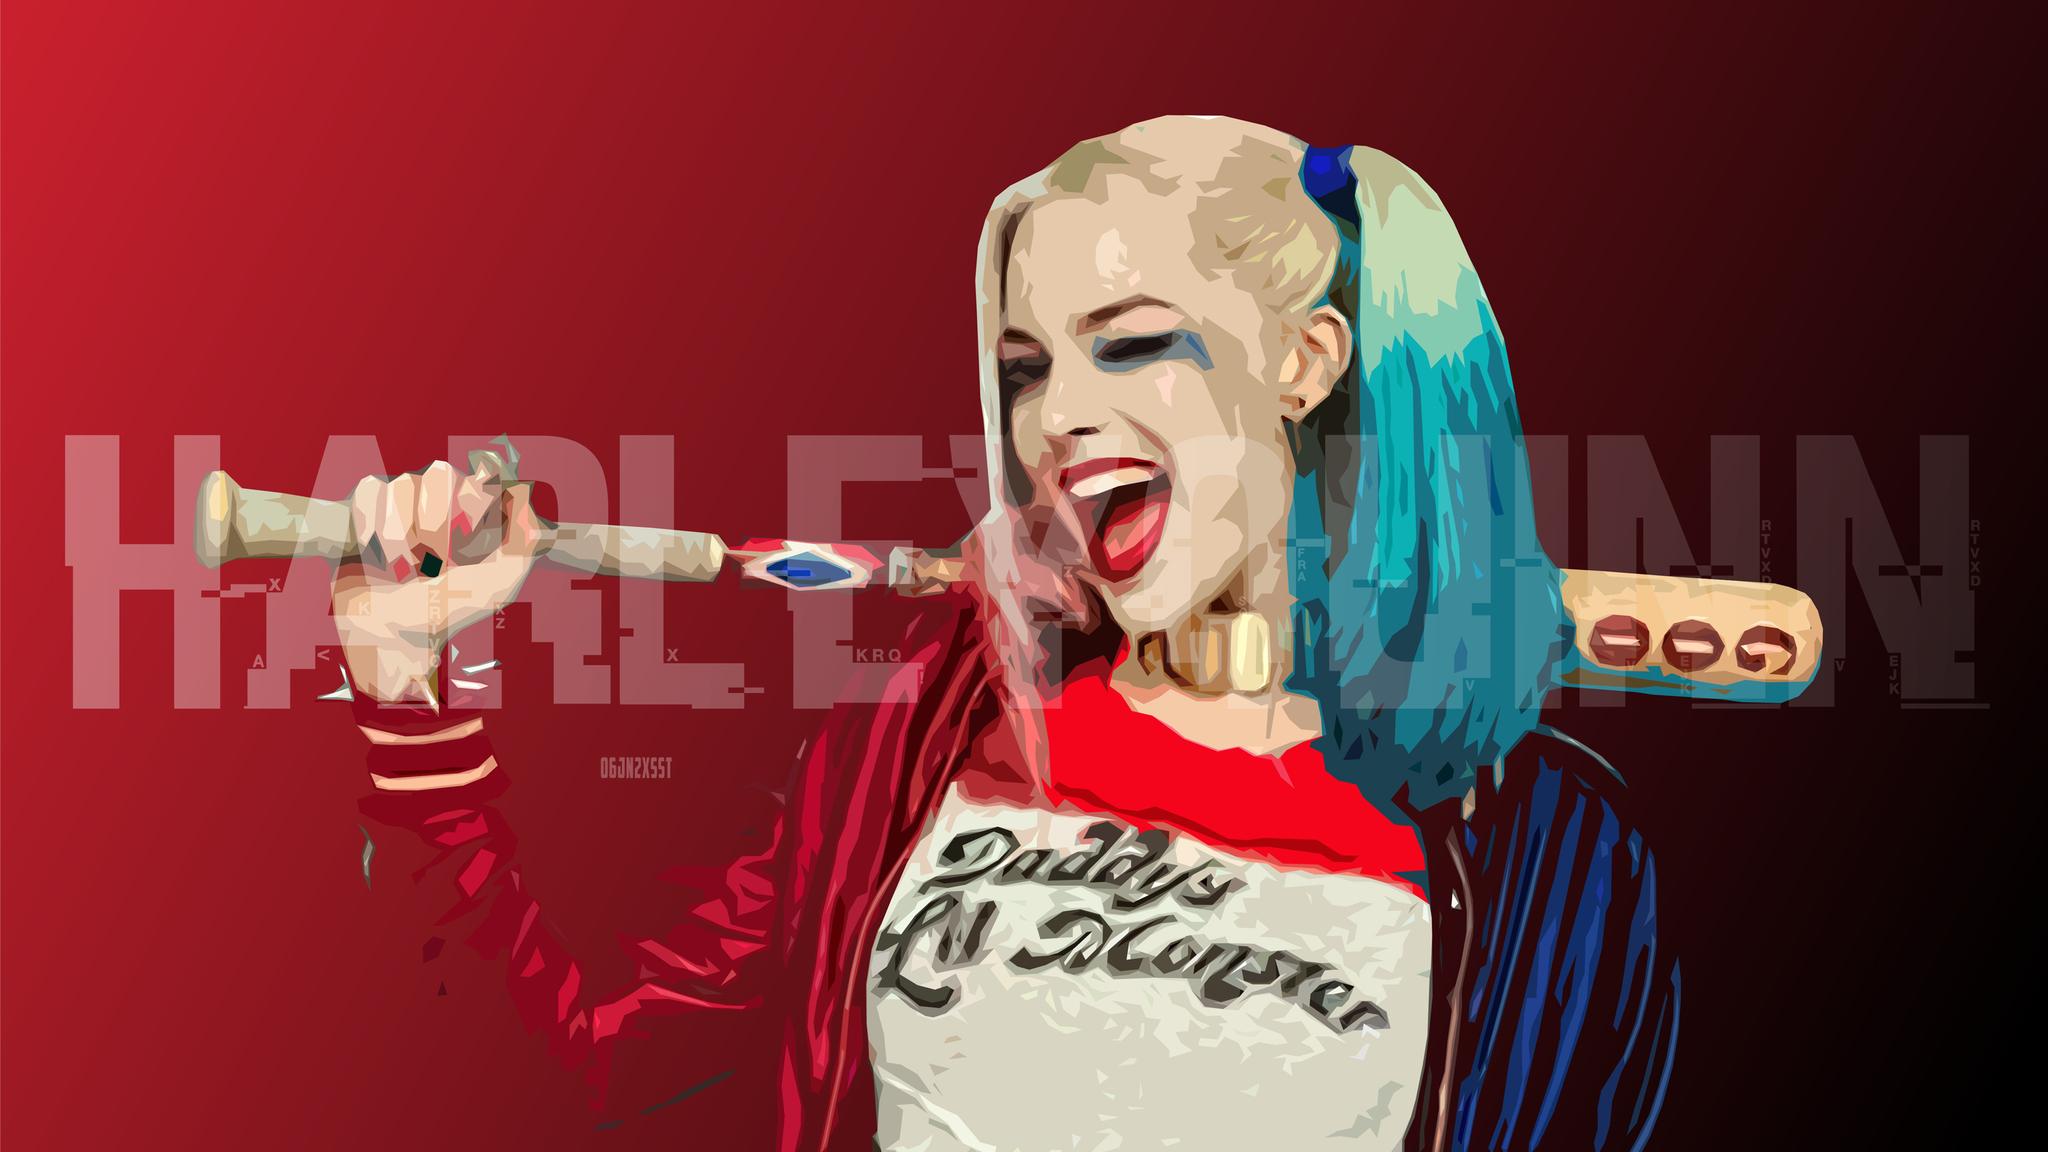 2048x1152 Harley Quinn Digital Art Hd 2048x1152 Resolution